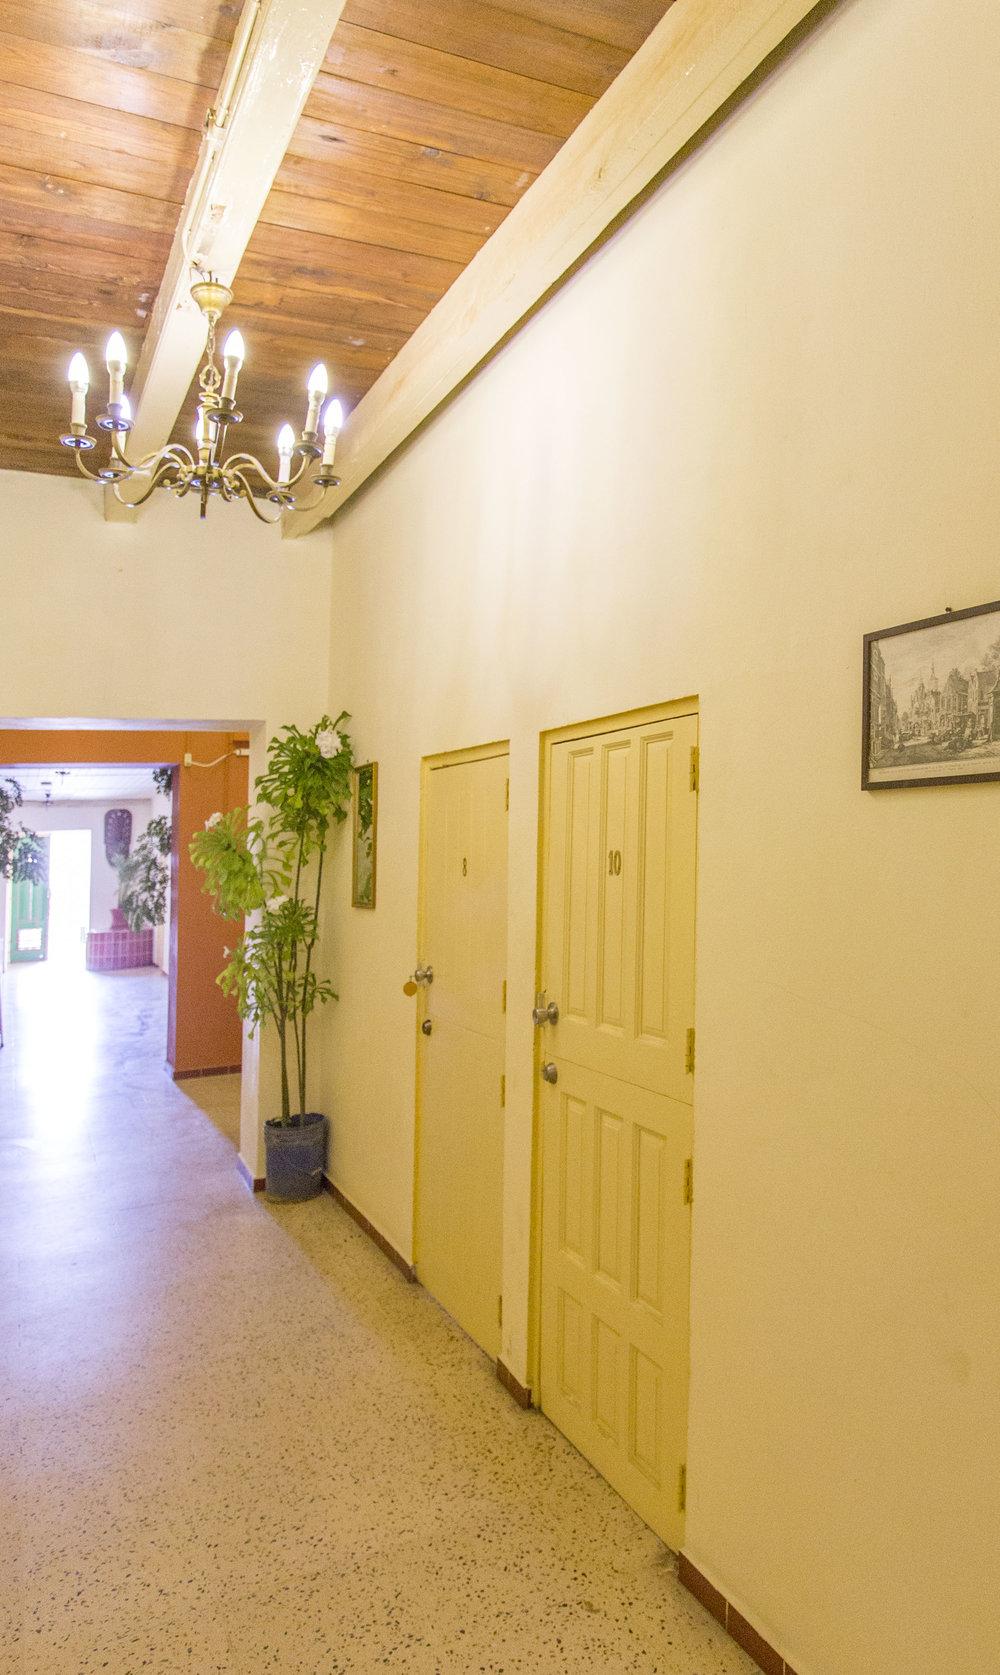 StageDesk-Curaçao-Stagehuis-BergAltena-Pelikaan-huis34.jpg